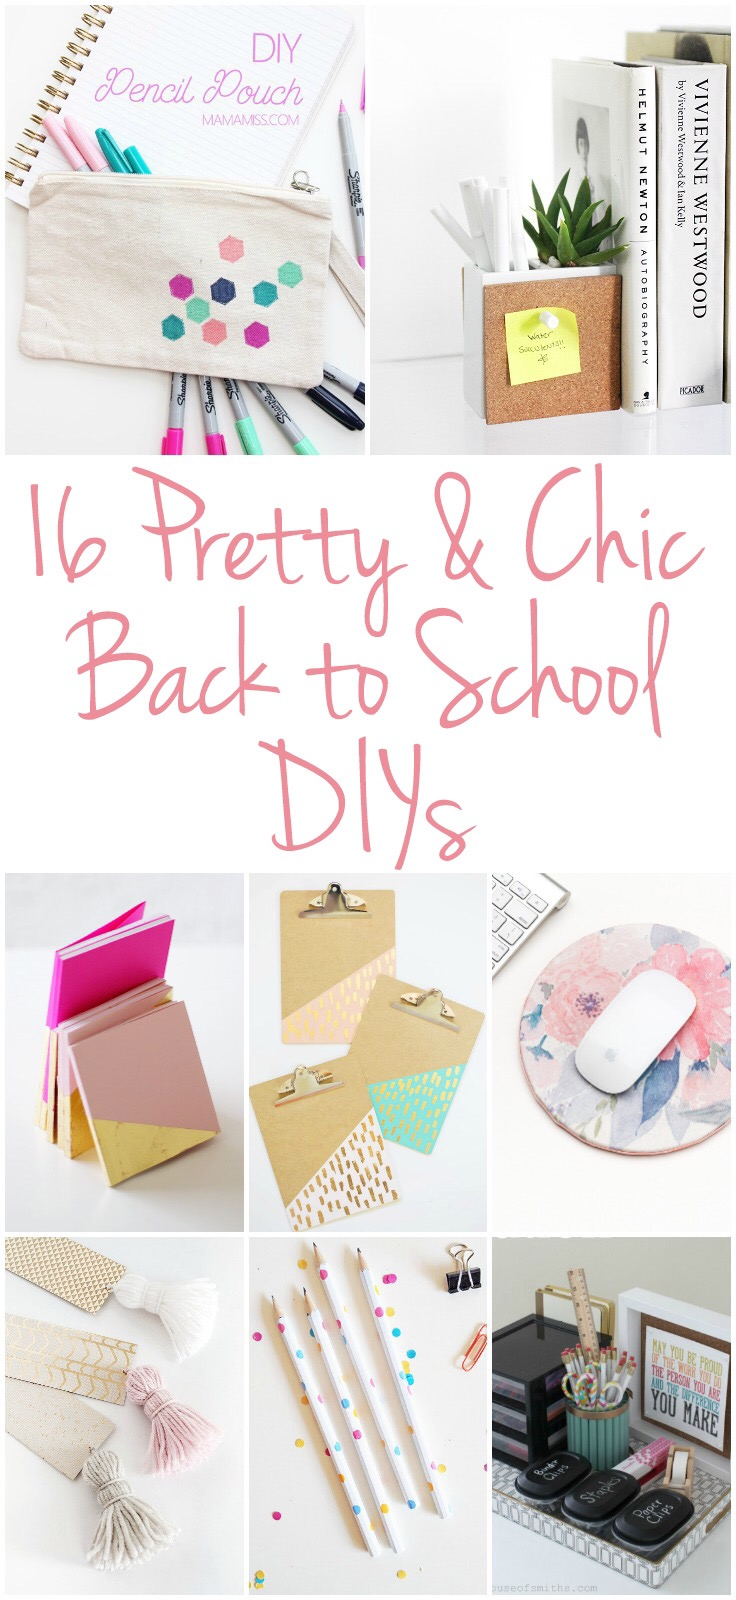 16 Pretty & Chic Back to School DIYs, home office organization, back to school crafts, office supplies, DIY, modern office decor